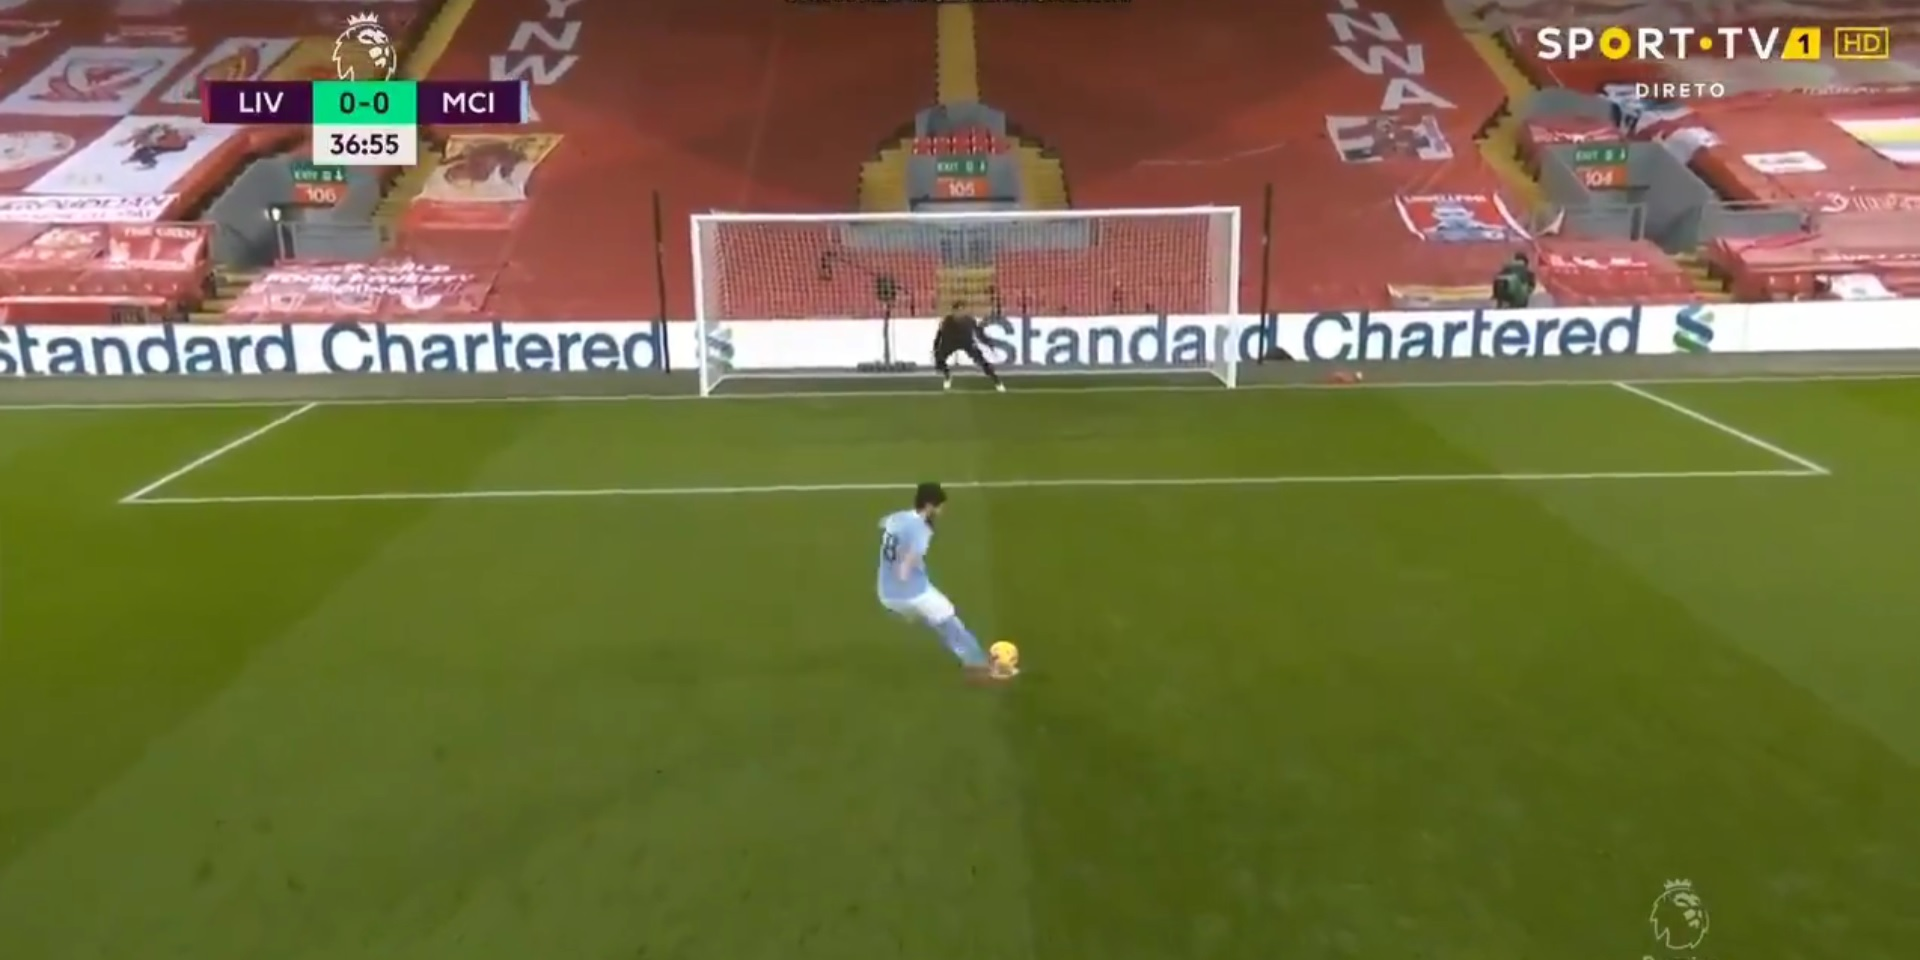 (Video) Gundogan skies penalty at Kop end as City's Anfield hoodoo continues